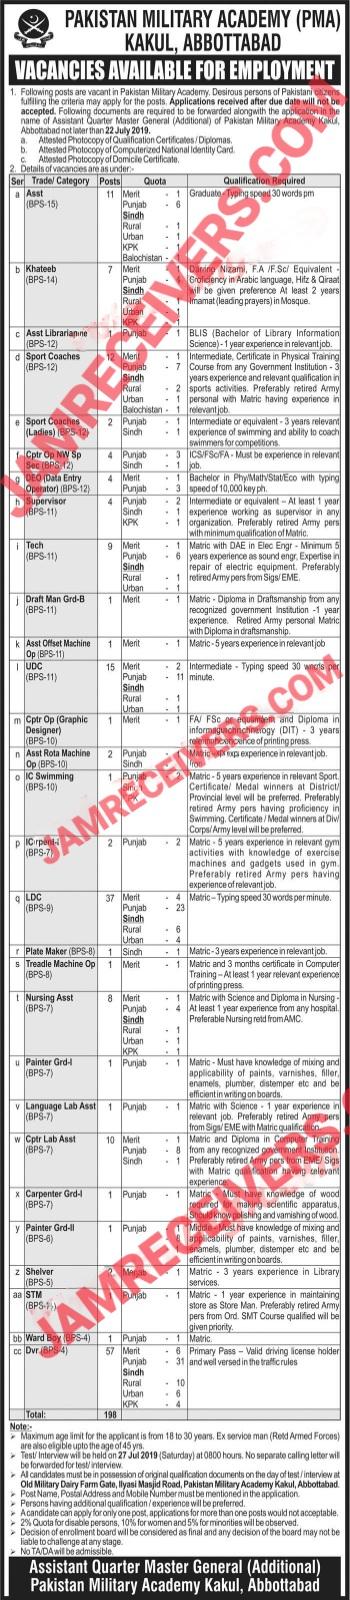 Pakistan Military Academy (PMA) Latest Jobs 2019